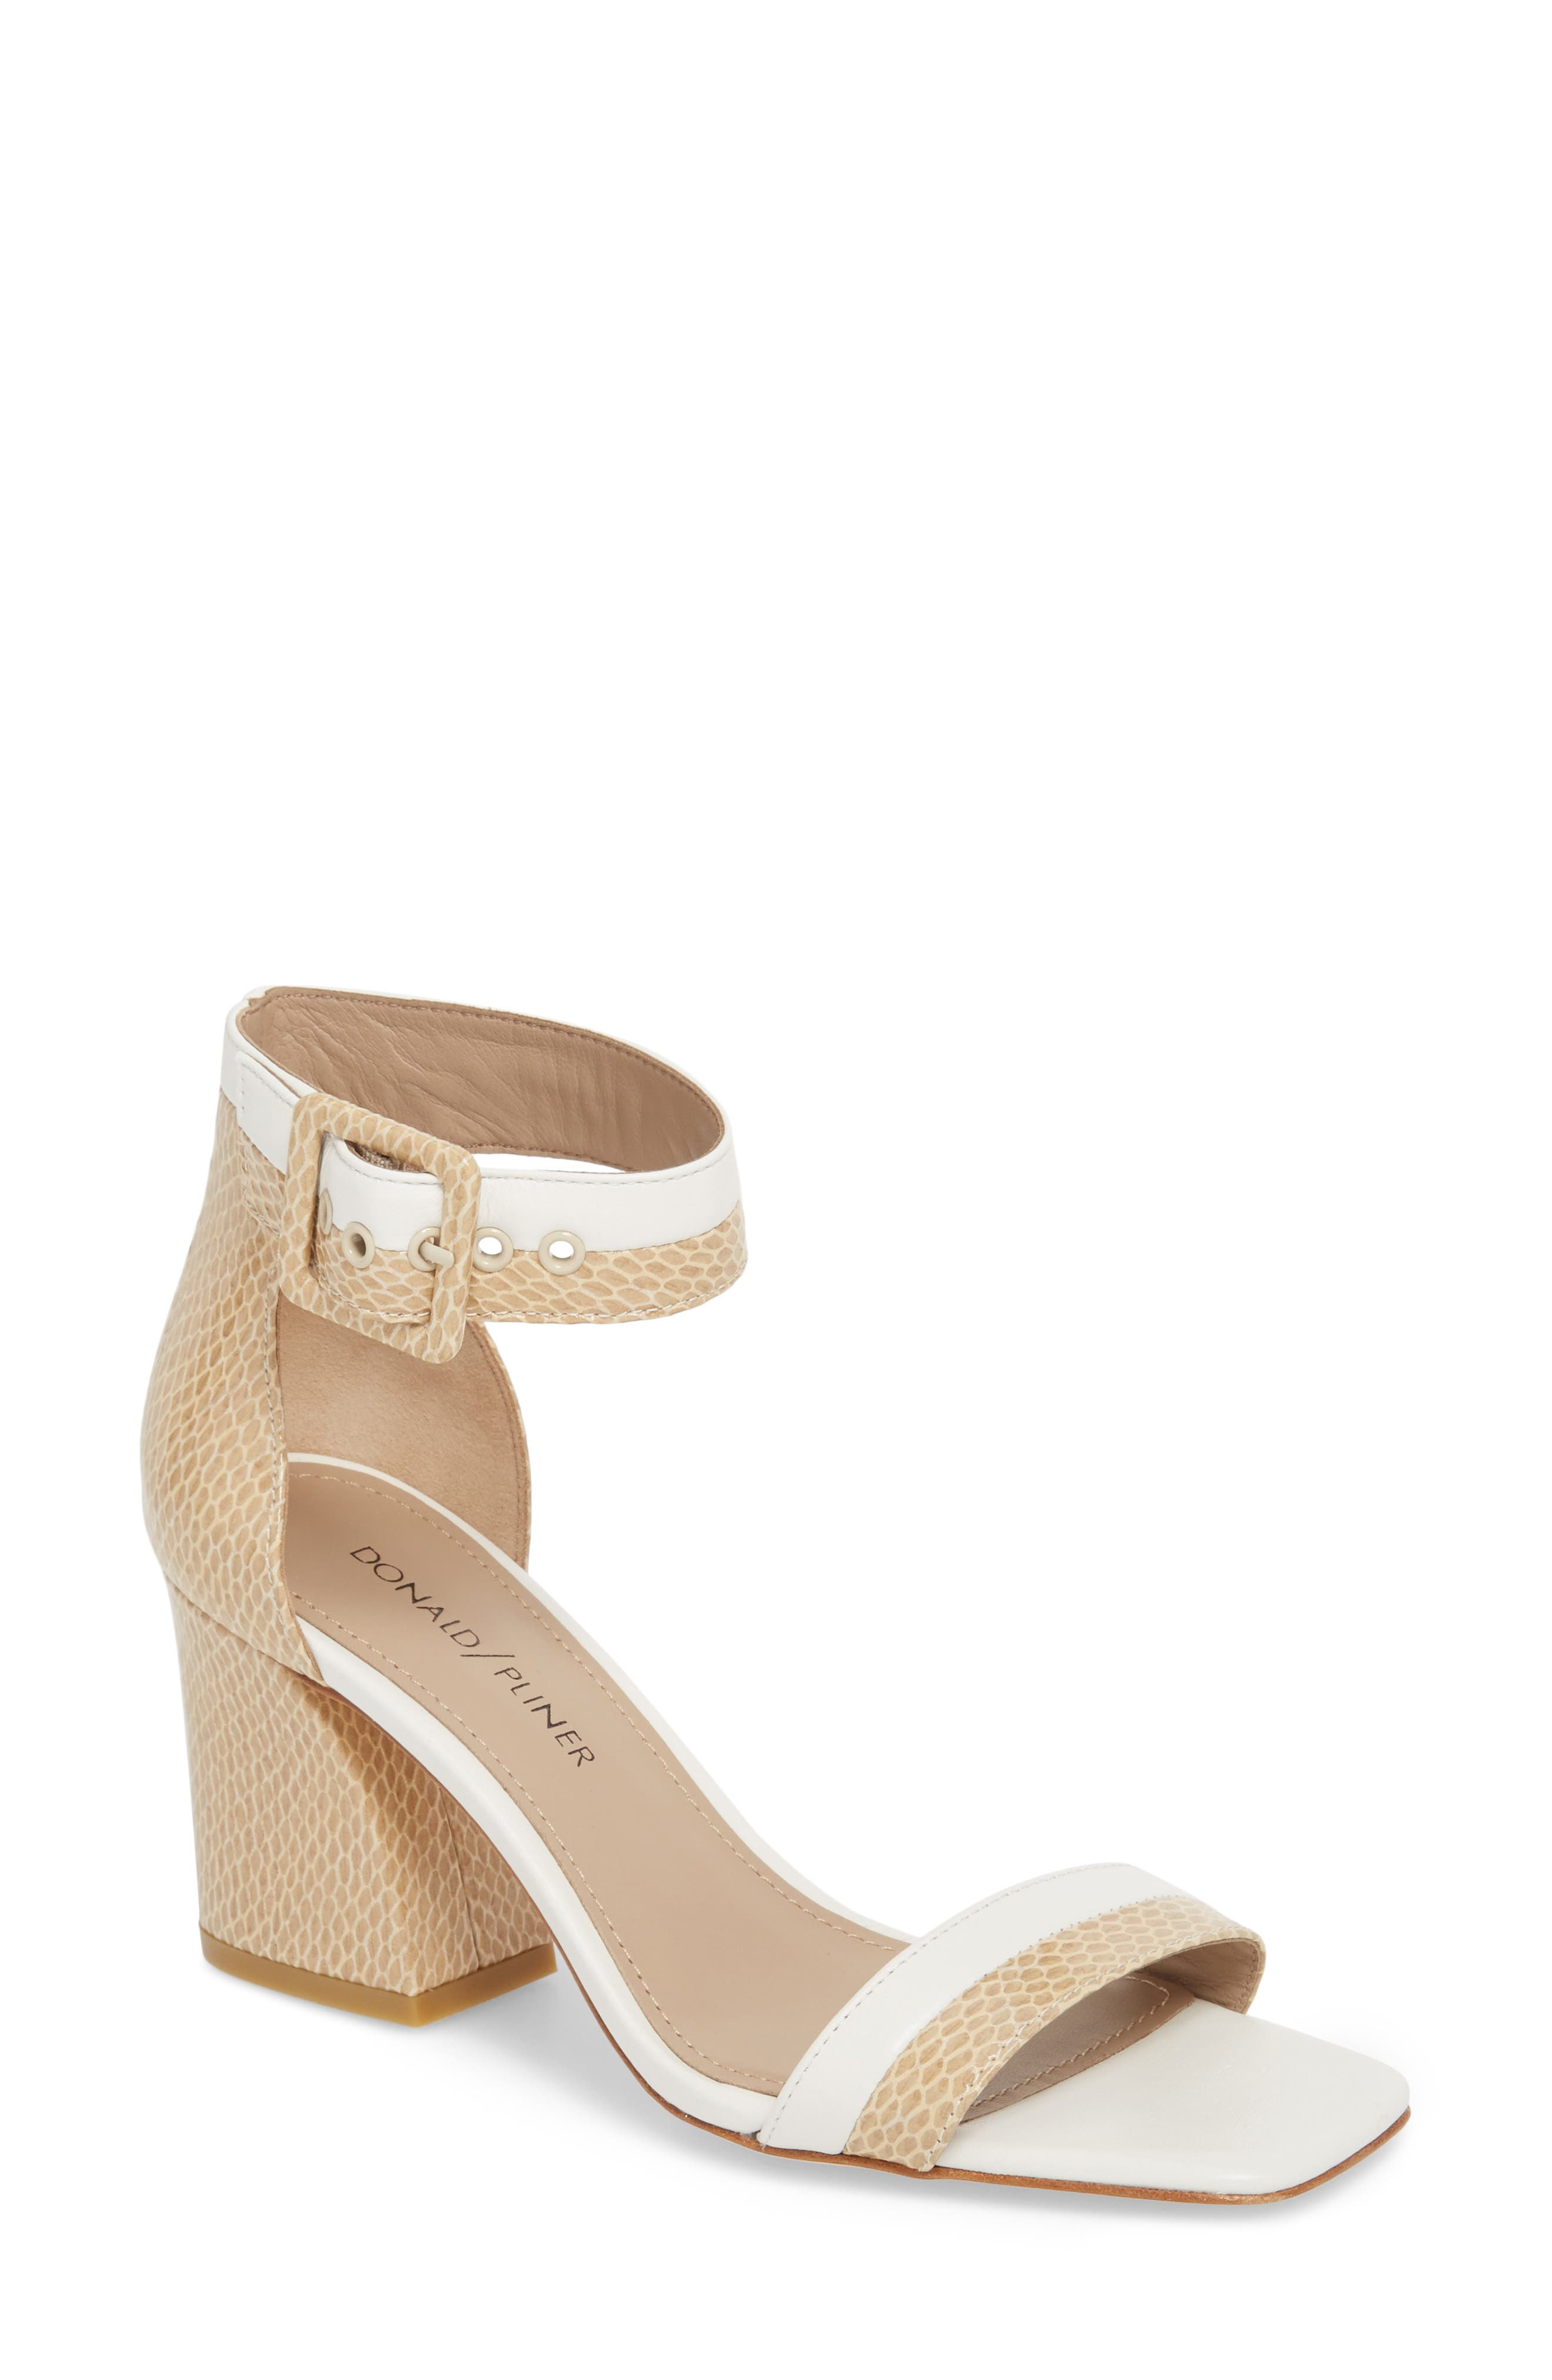 DONALD PLINER,                             Watson Ankle Strap Sandal,                             Main thumbnail 1, color,                             250